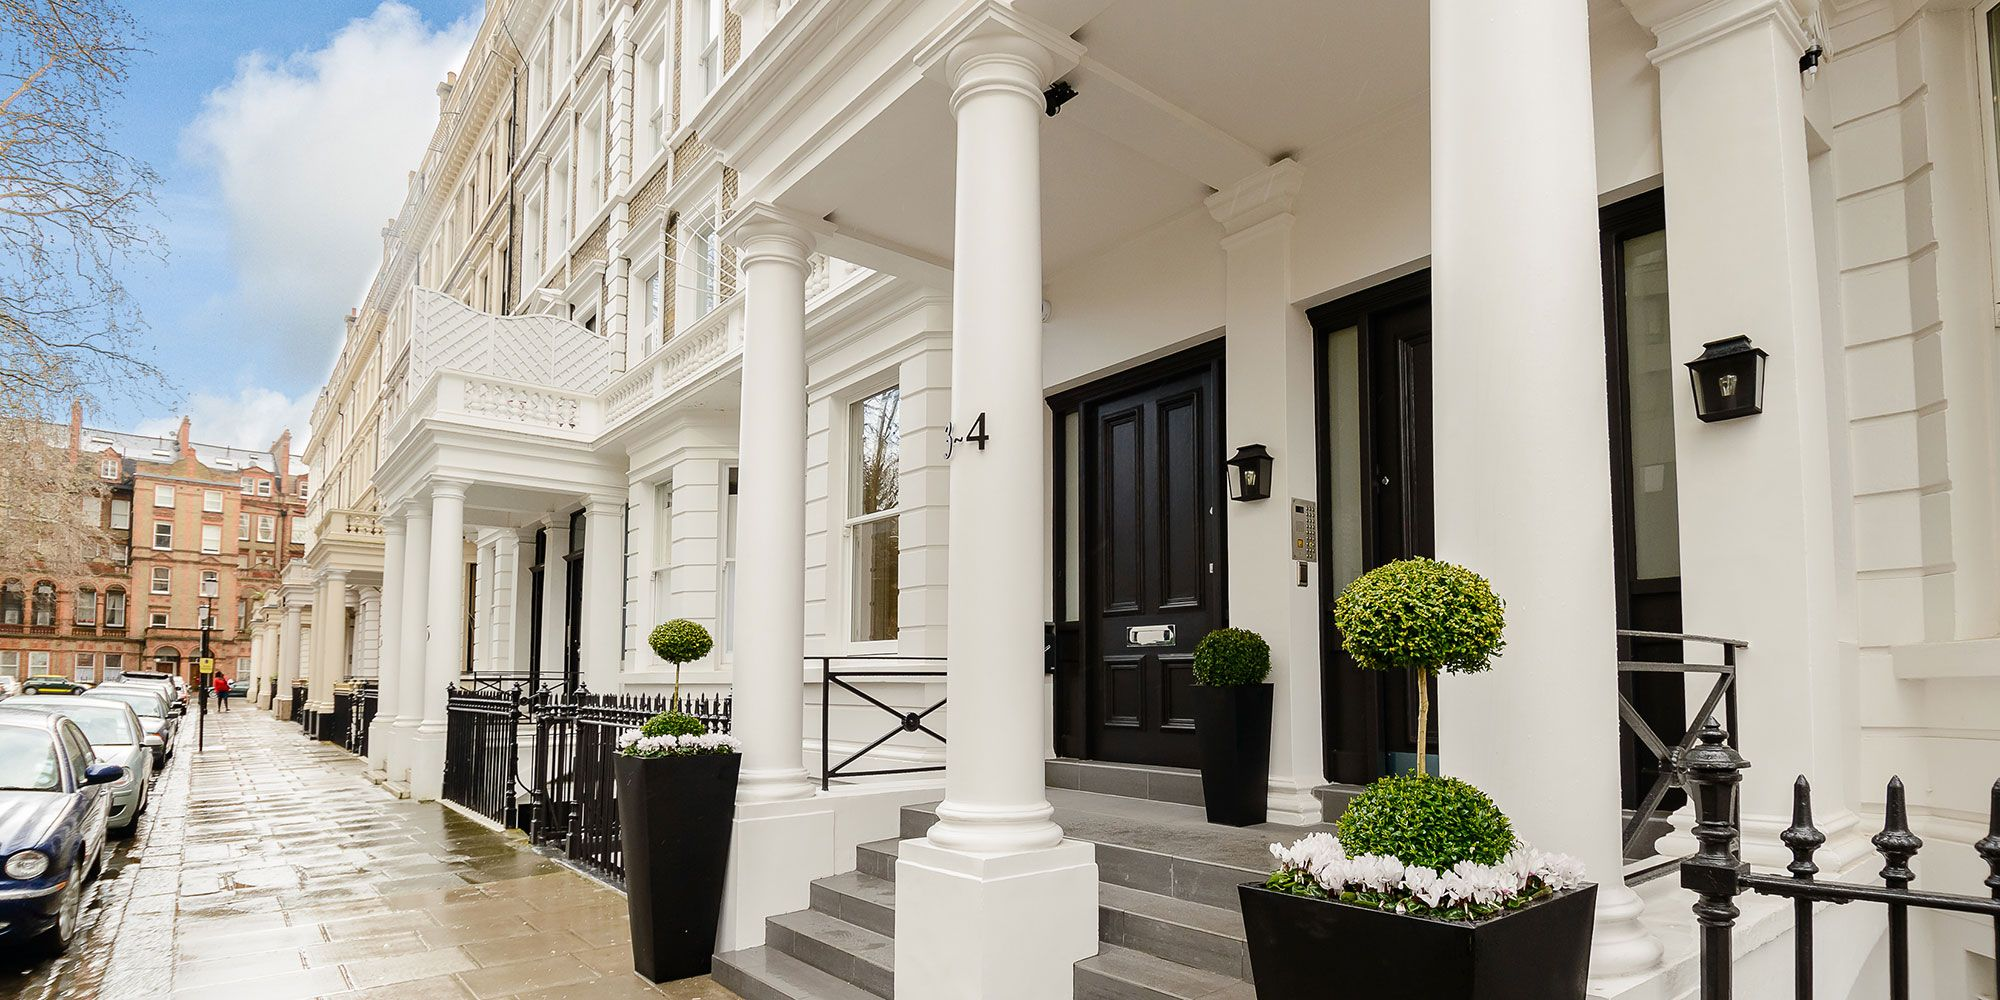 kensington apartments london - Google Search | Kensington ...